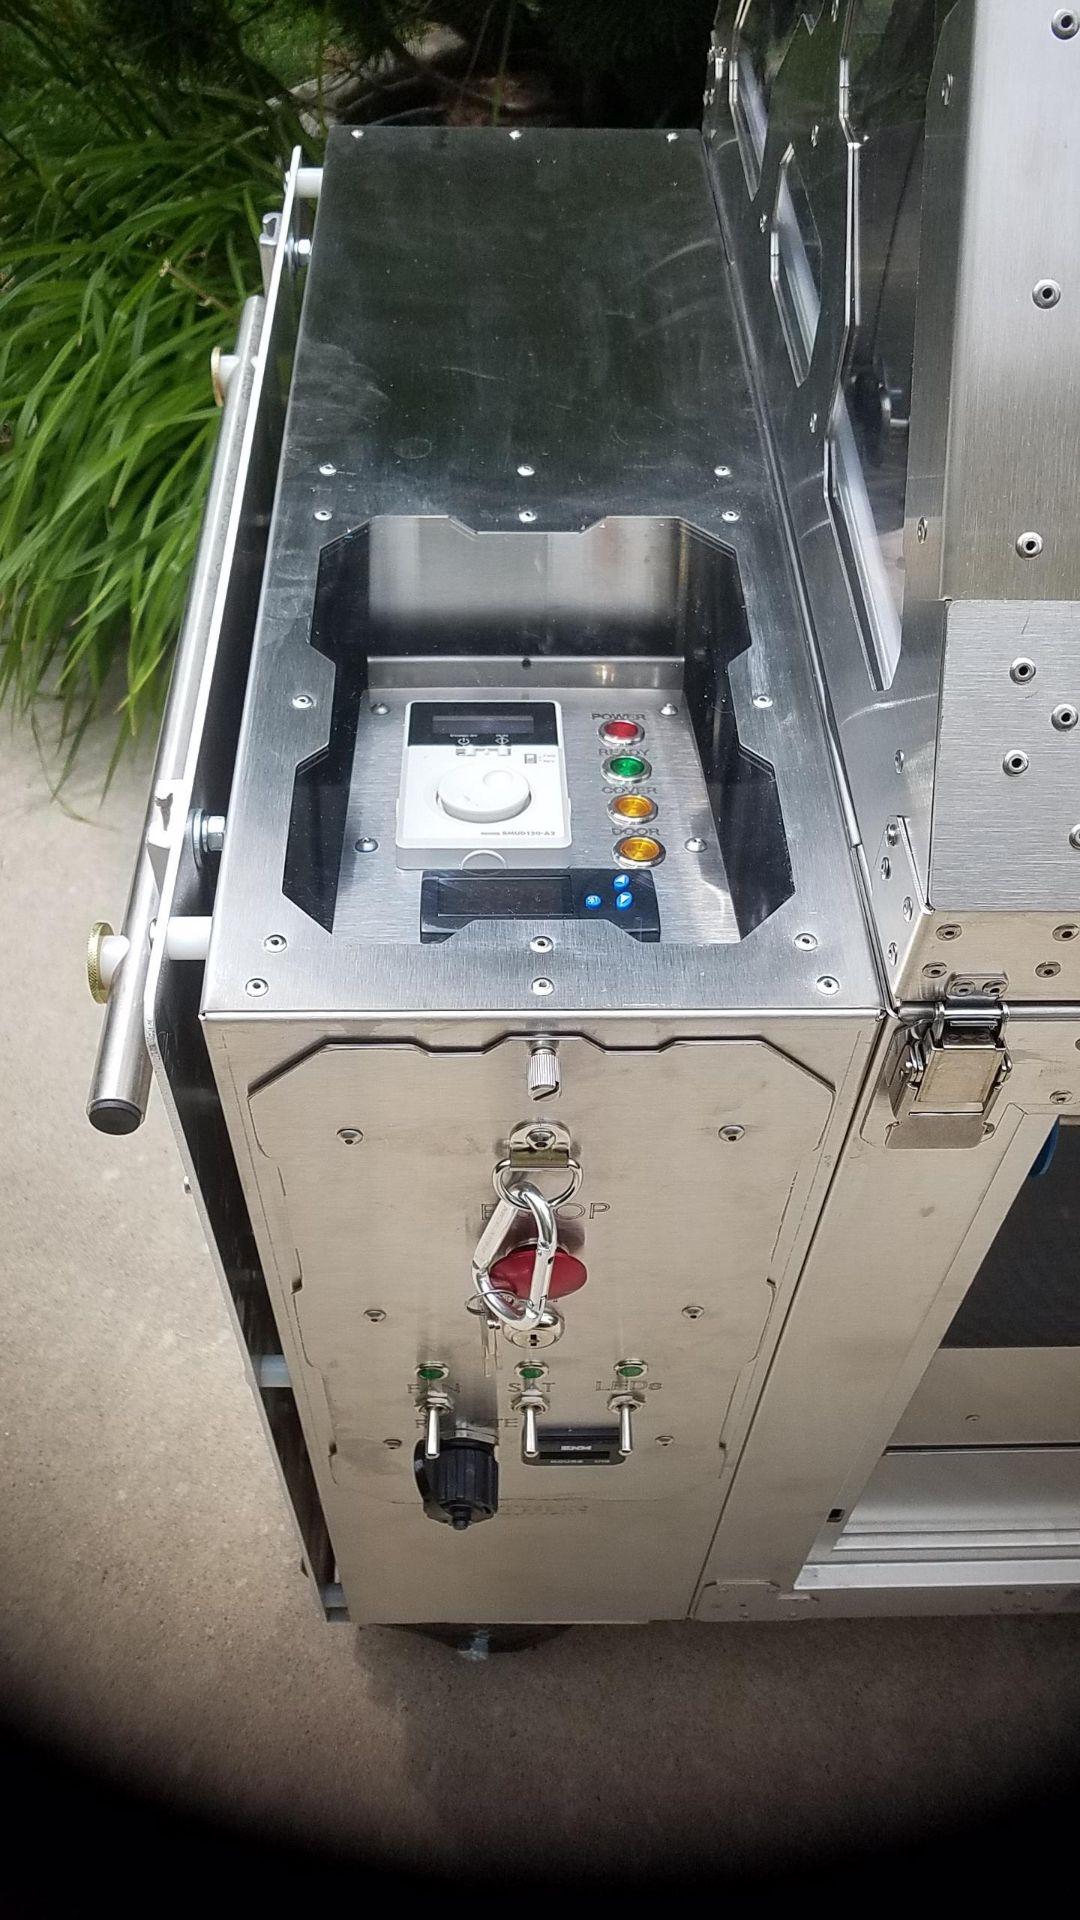 Unused/FactoryNew Revolution Cannabis & Hemp Flower Finisher System Model RDF 4300. Make $1,500/day - Image 20 of 32